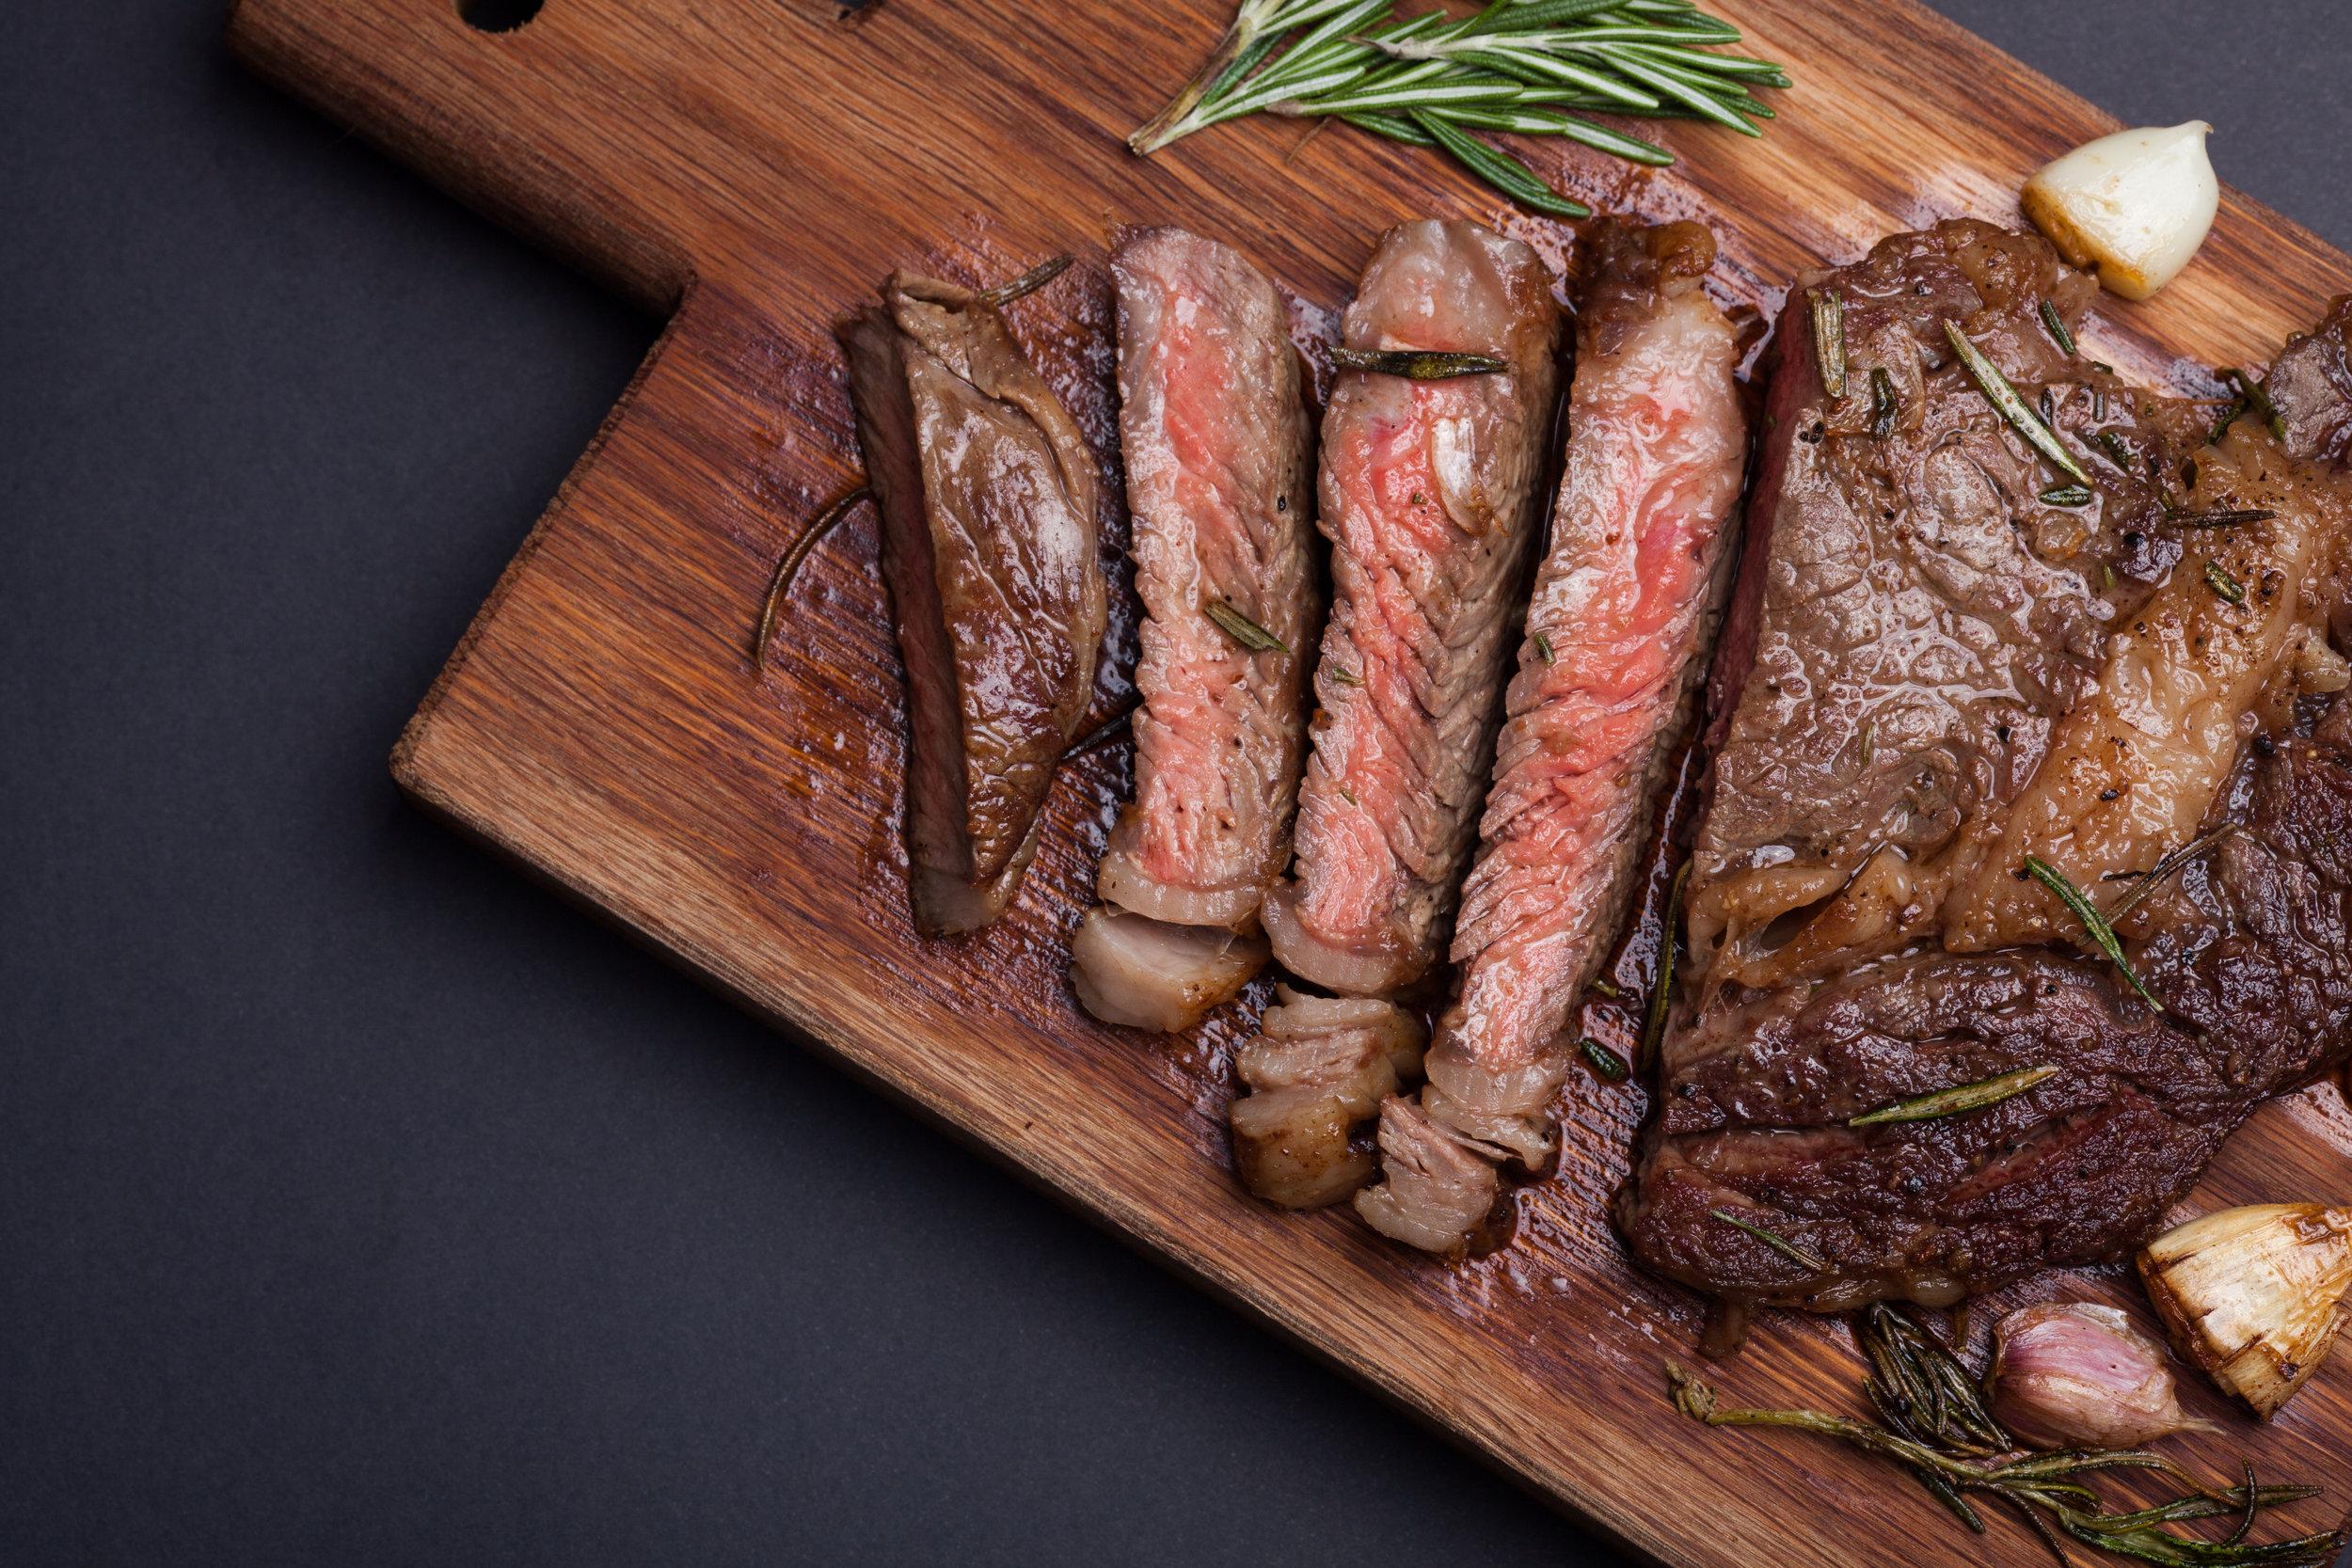 bigstock-Grilled-Rib-eye-Steak-Of-Marbl-185645917.jpg